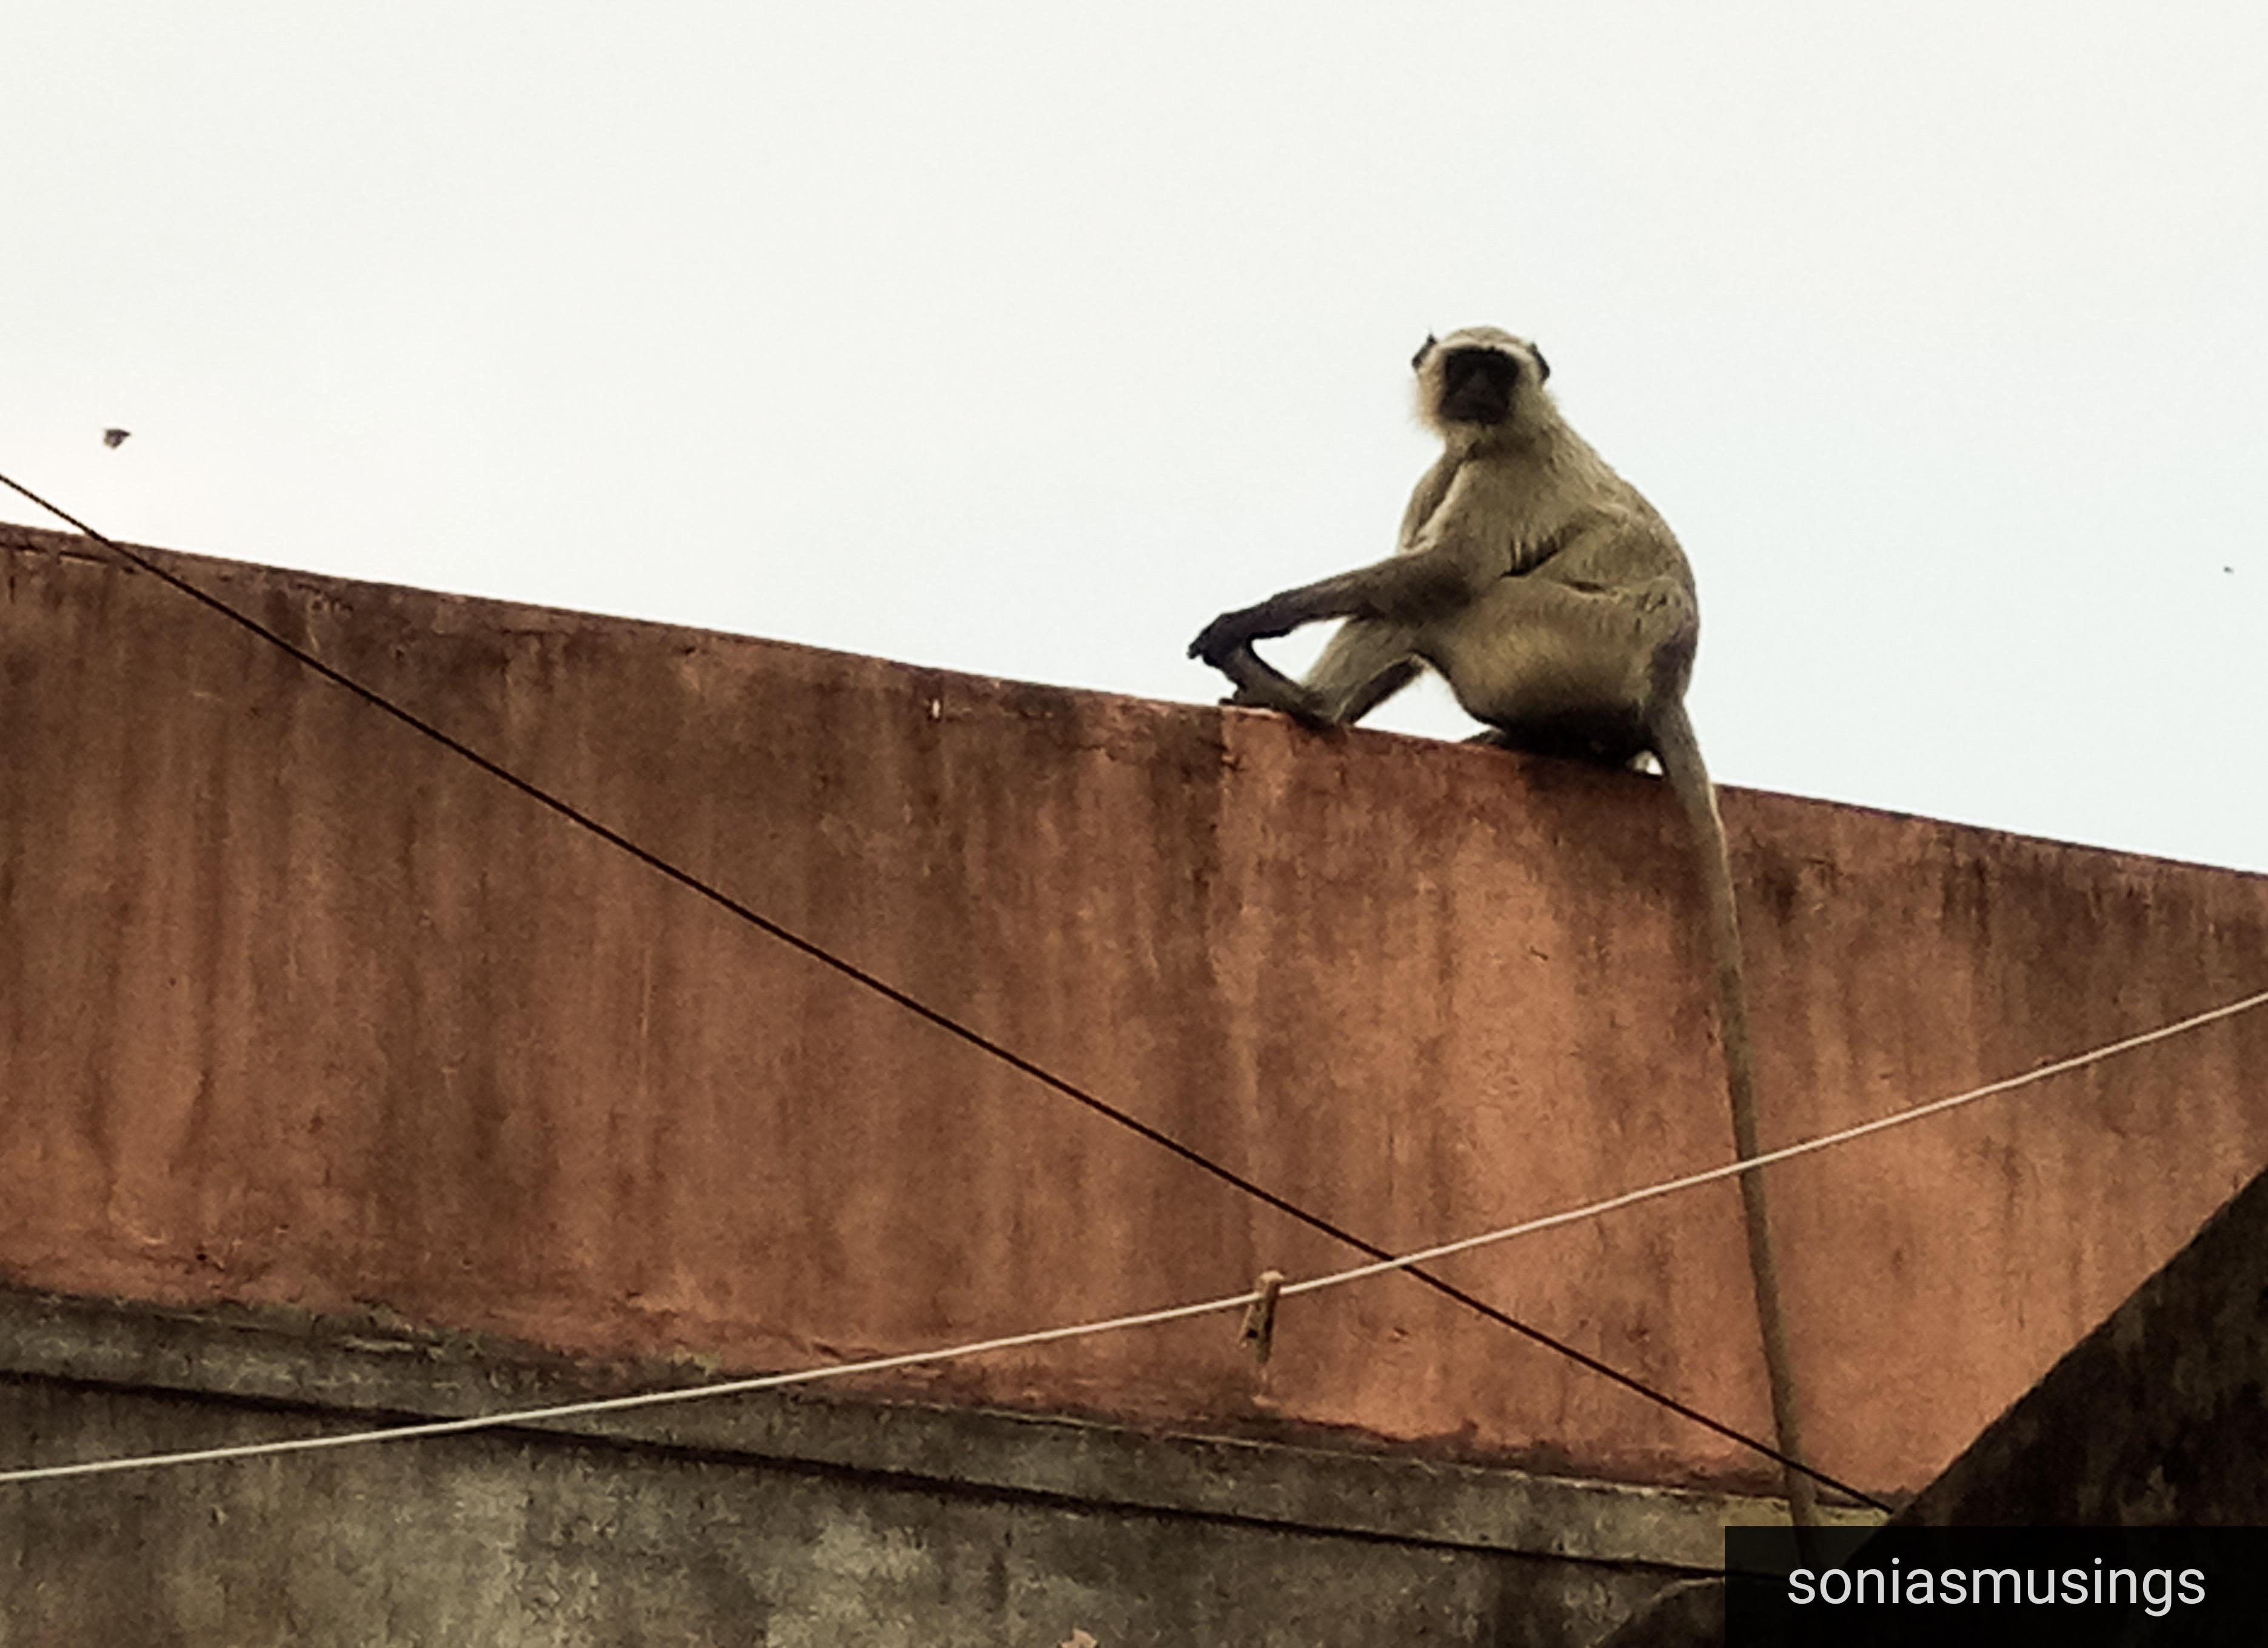 Monkey and eroding humanity